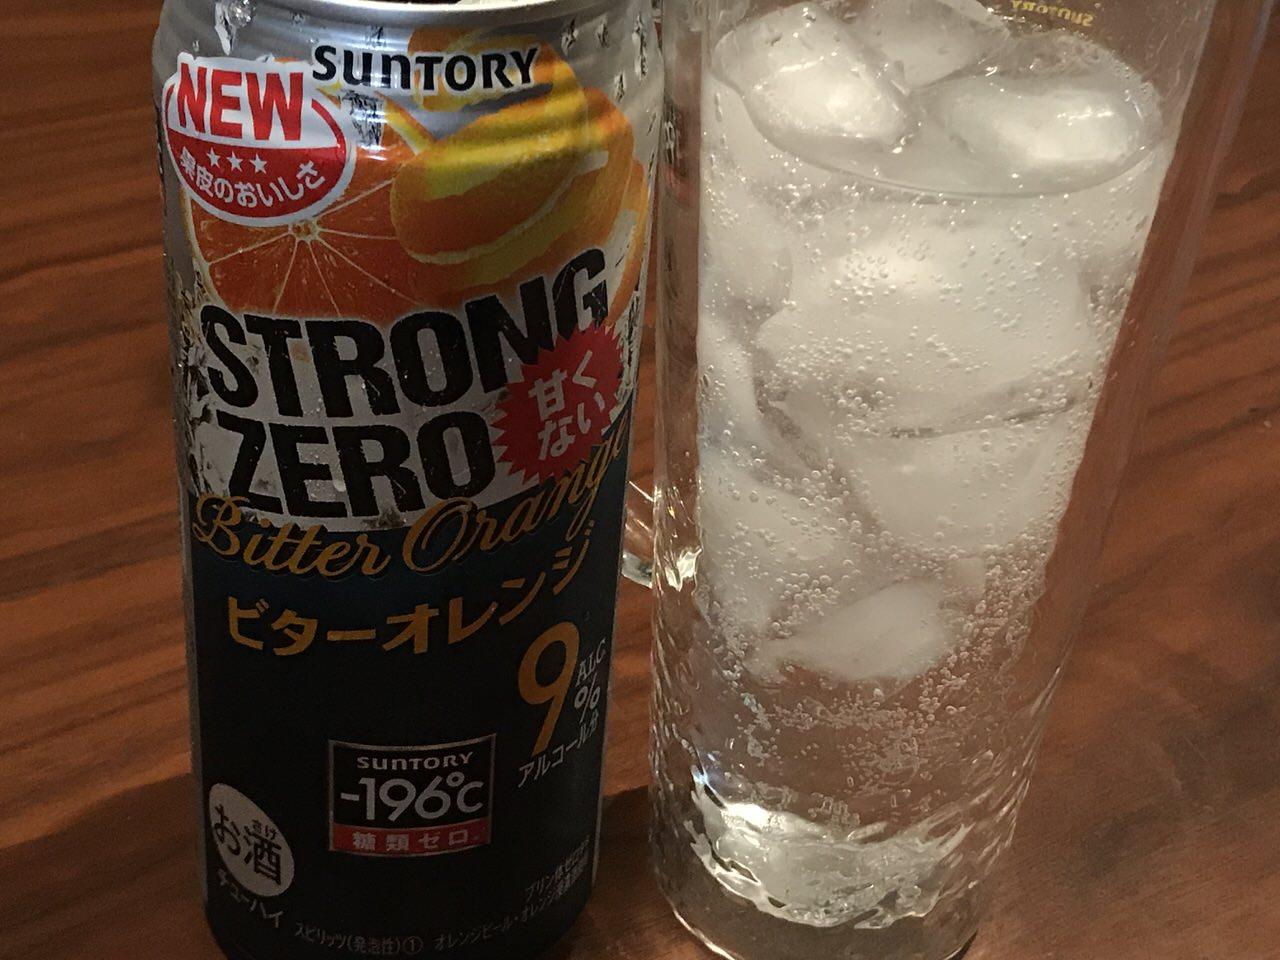 Strong zero bitter orange 7464